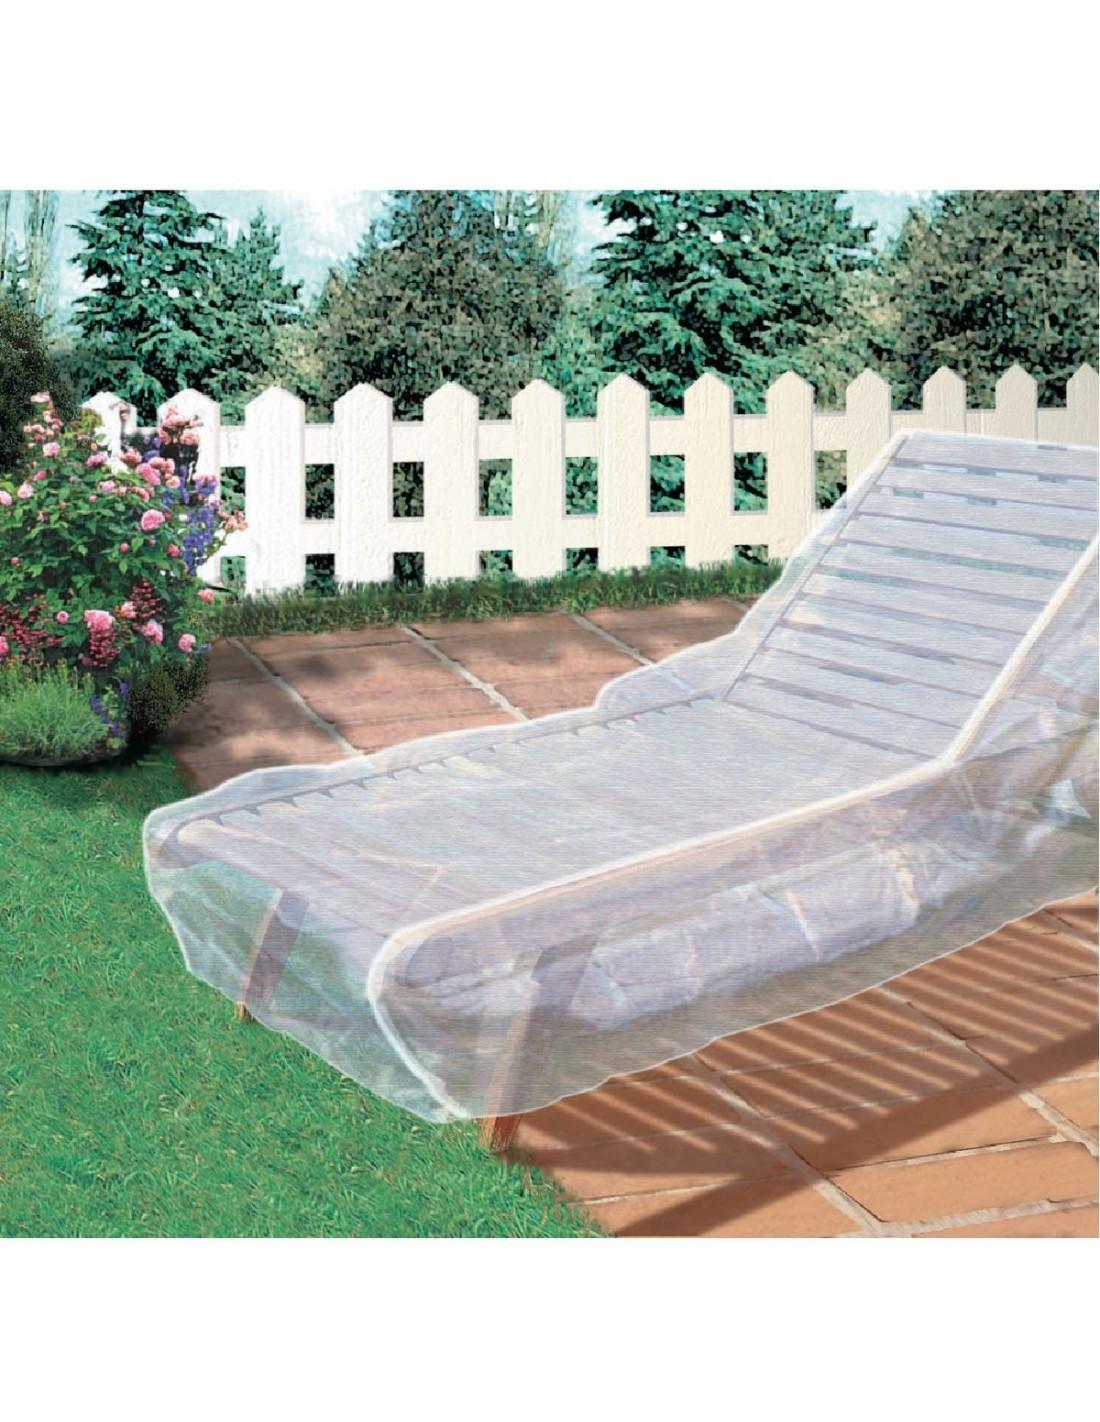 Housse chaise longue for Housse protection mobilier exterieur